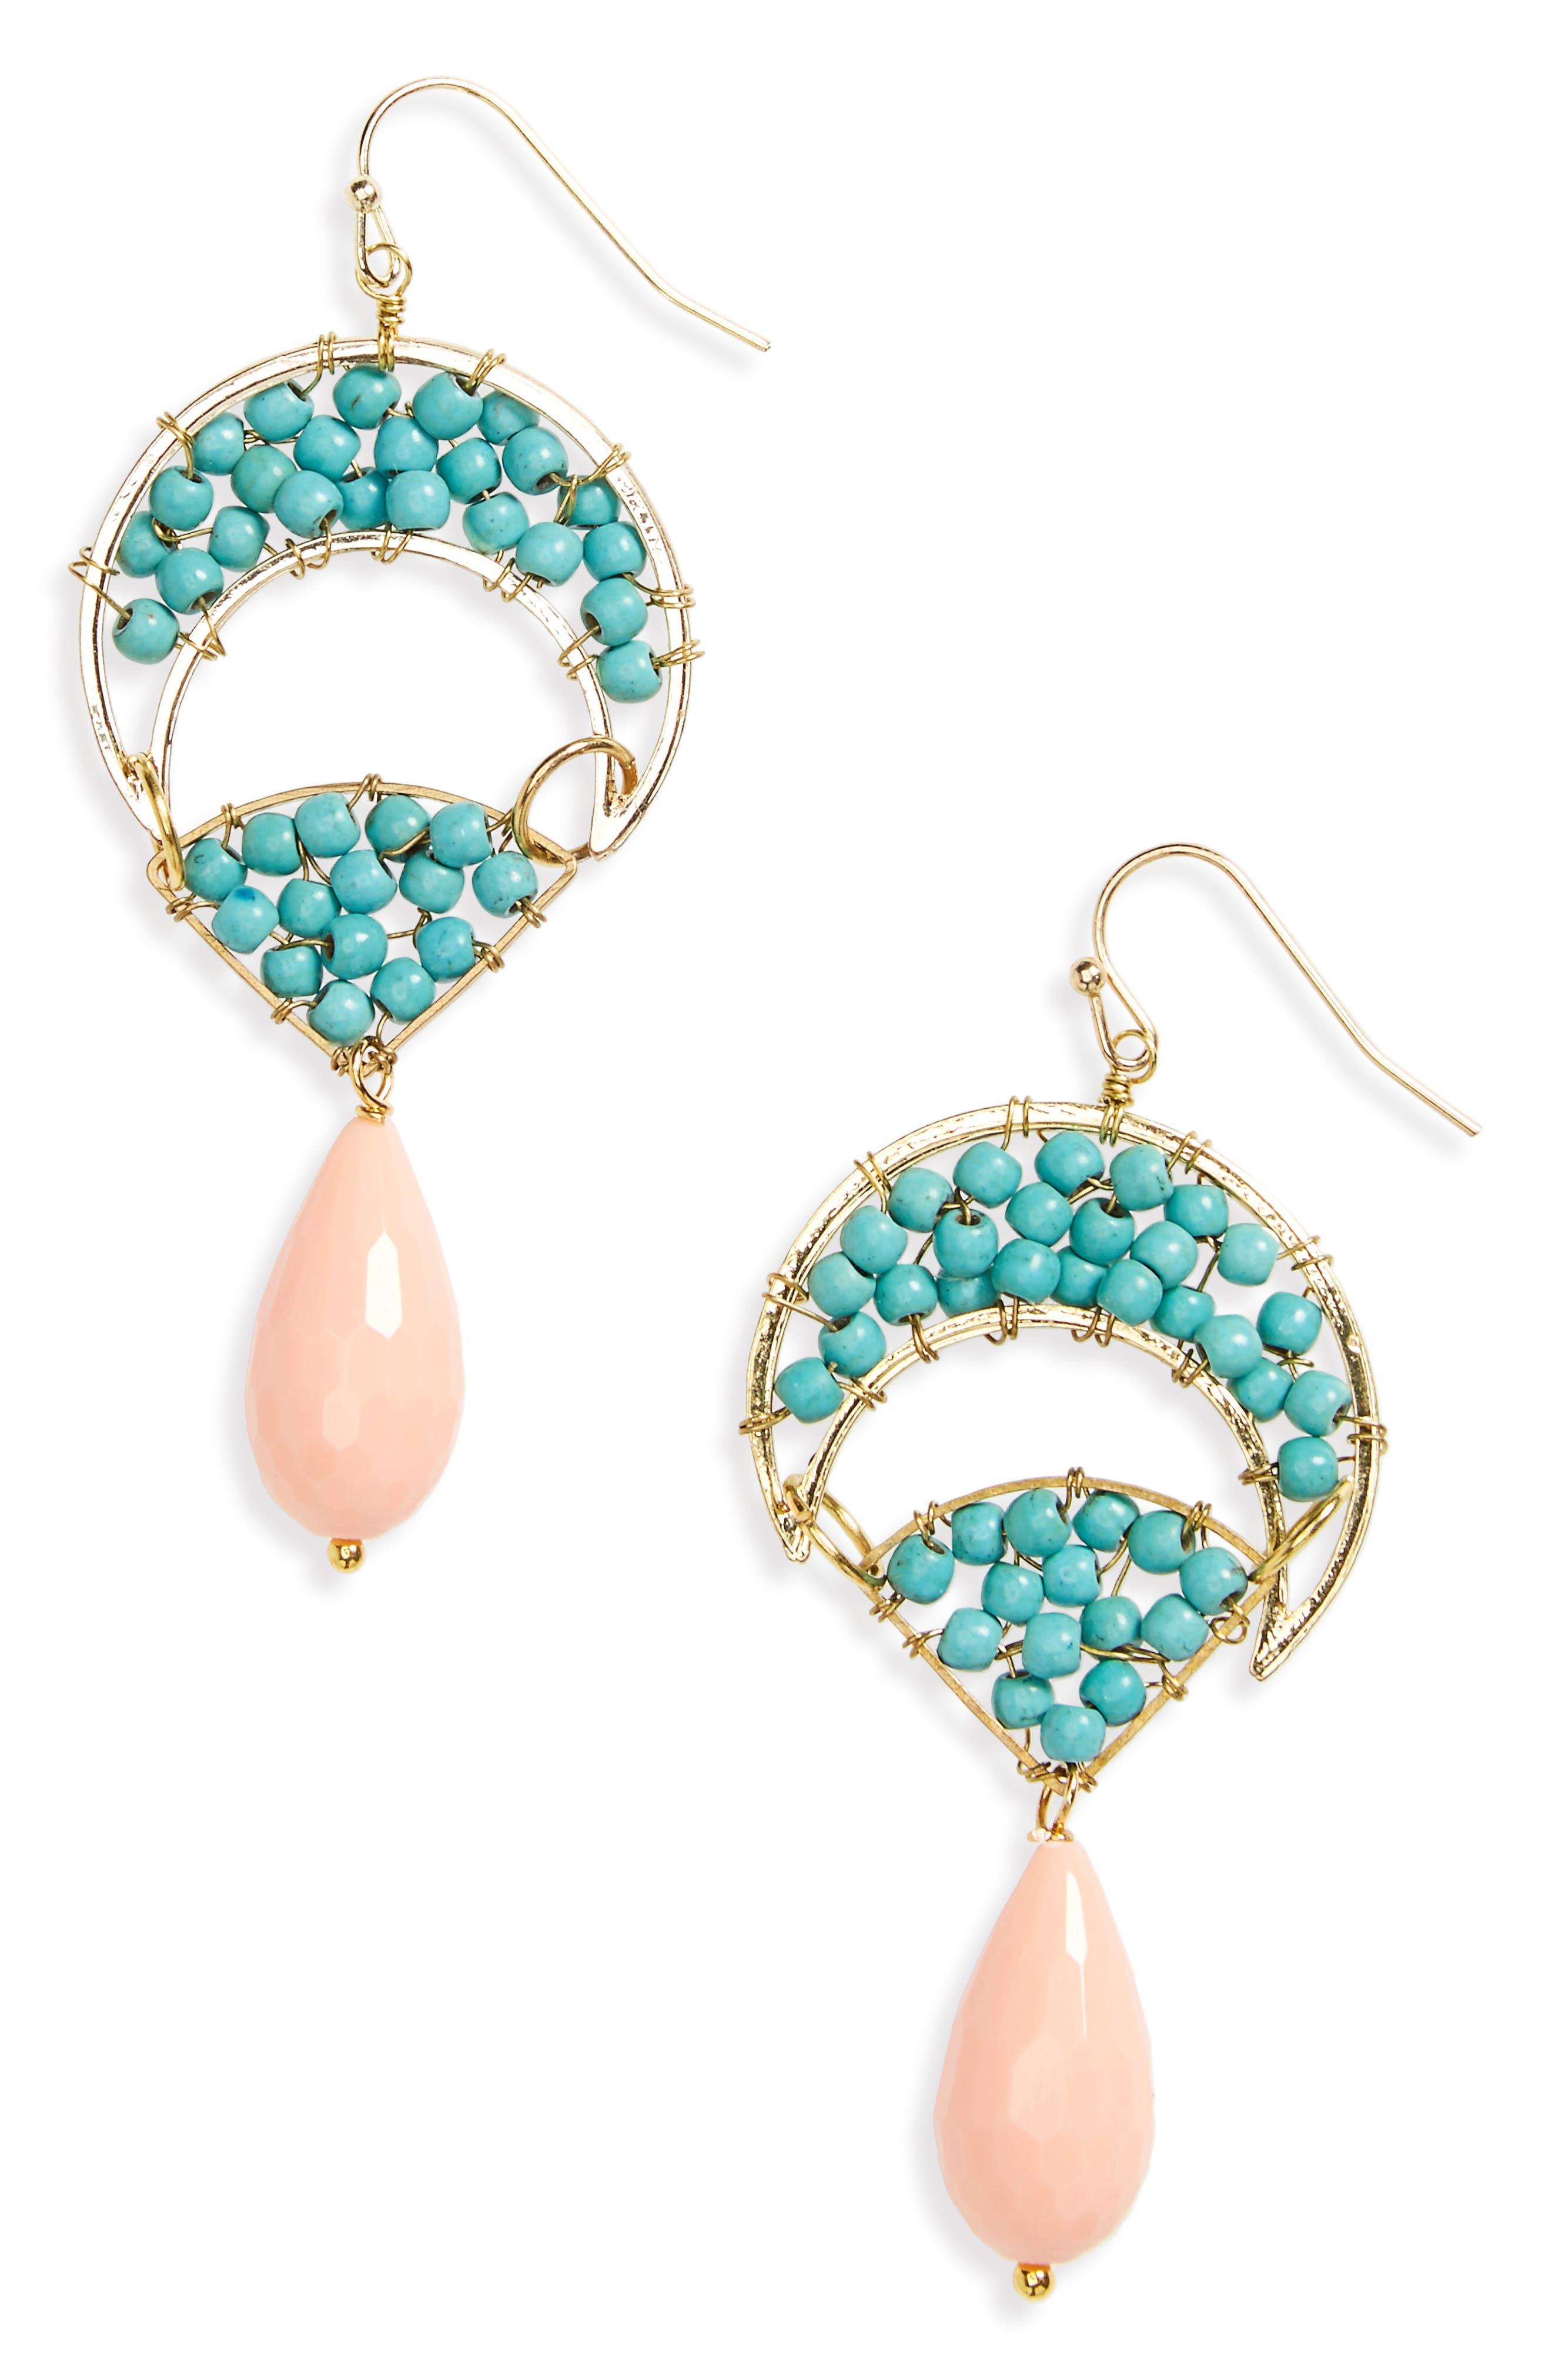 Beaded Howlite Stone Drop Earrings,                             Main thumbnail 1, color,                             400